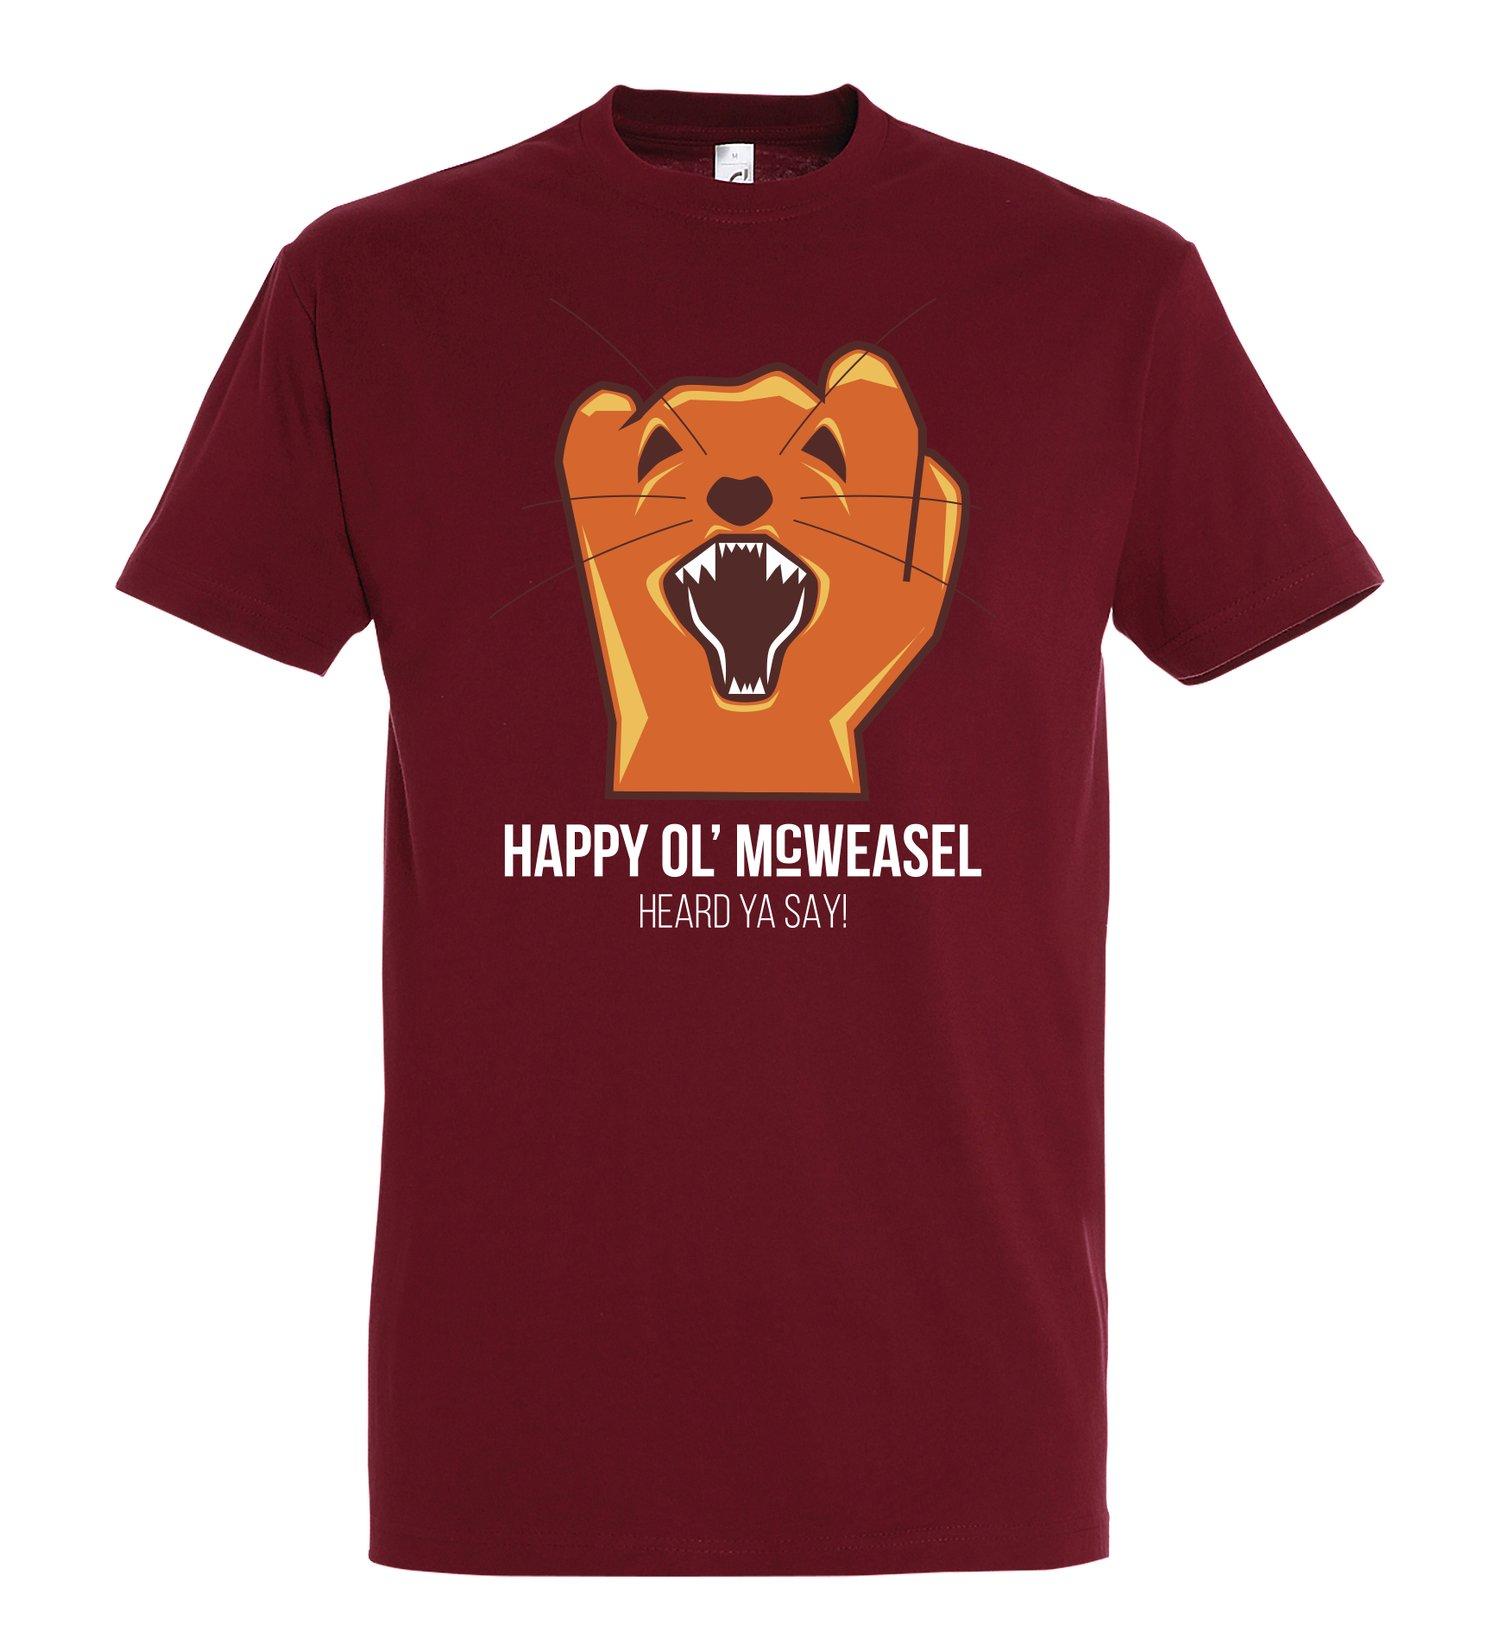 Image of HEARD YA SAY!, T-shirt, Red